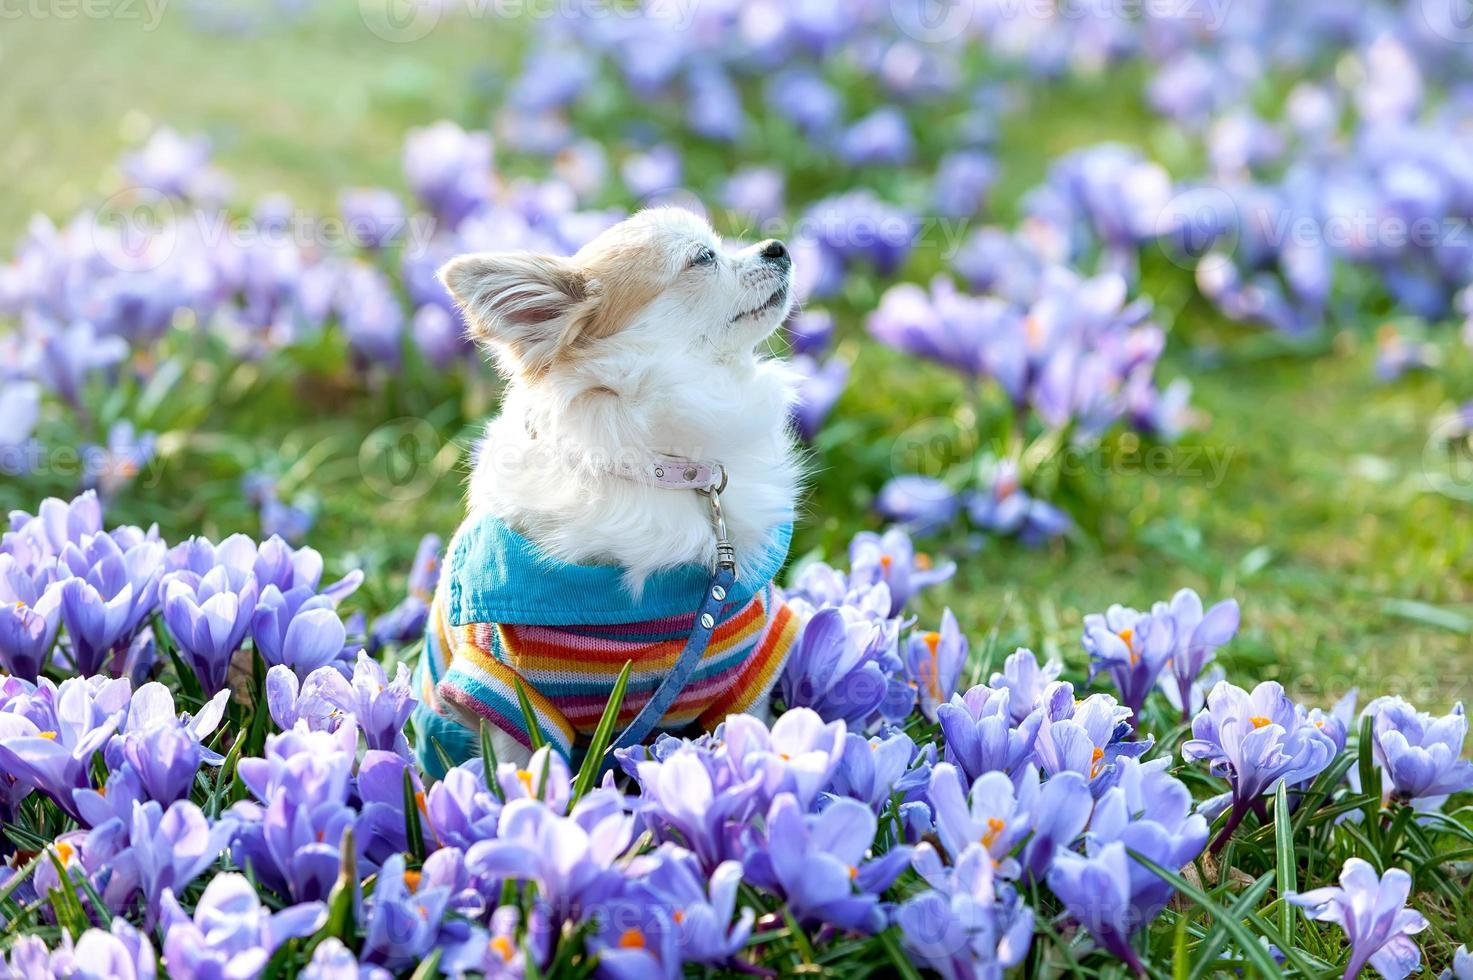 Chihuahua dog dreaming among purple crocus flowers photo